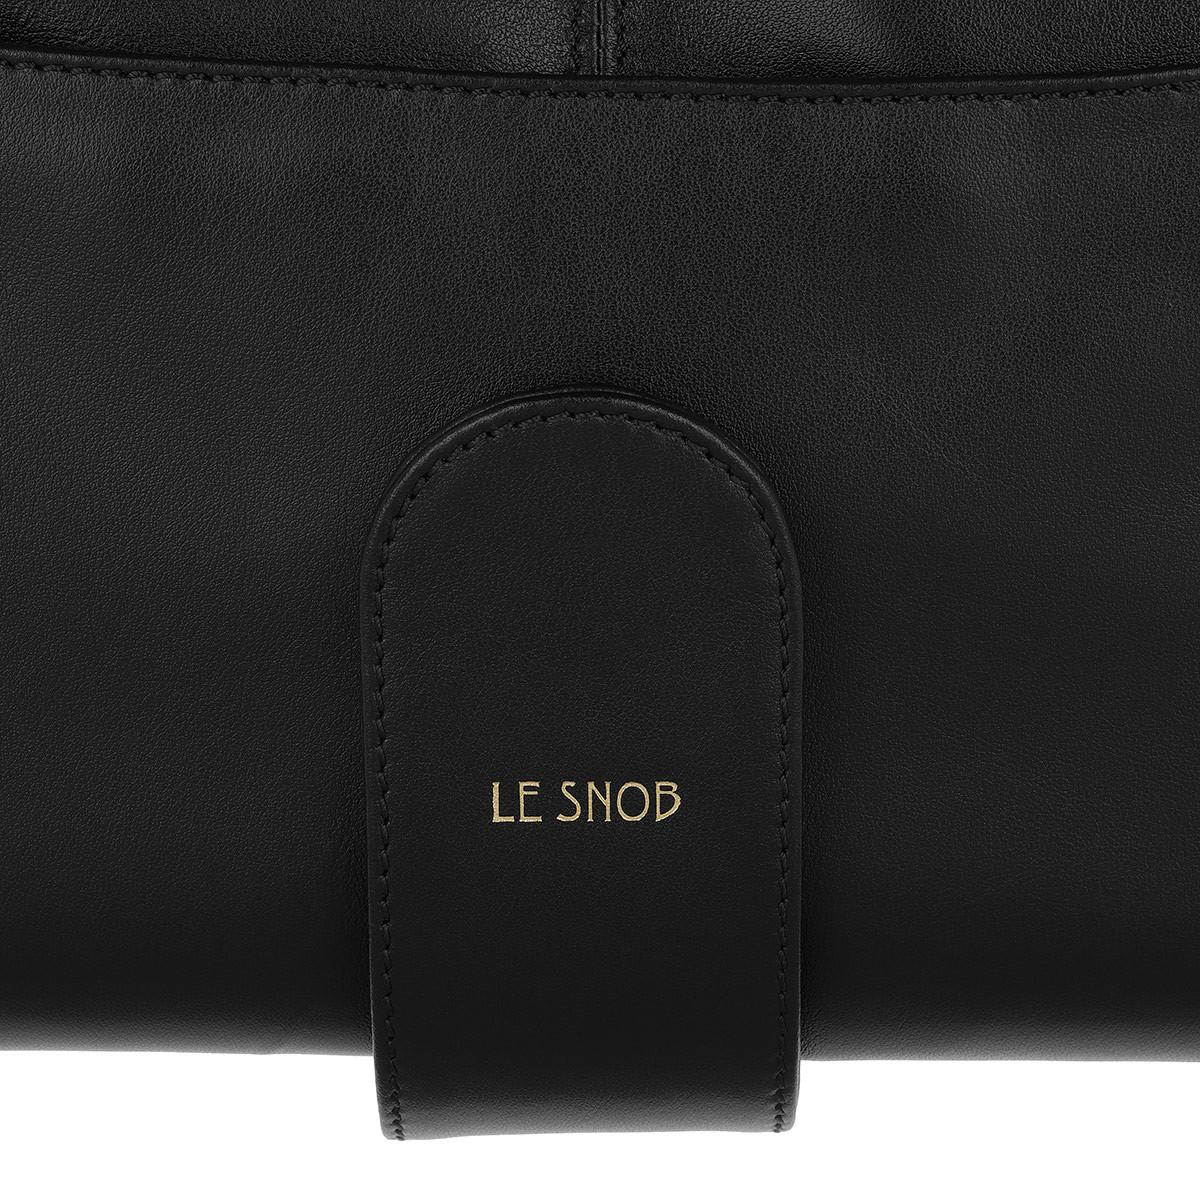 Le Snob Leather Le Clutch Tote 1 Black